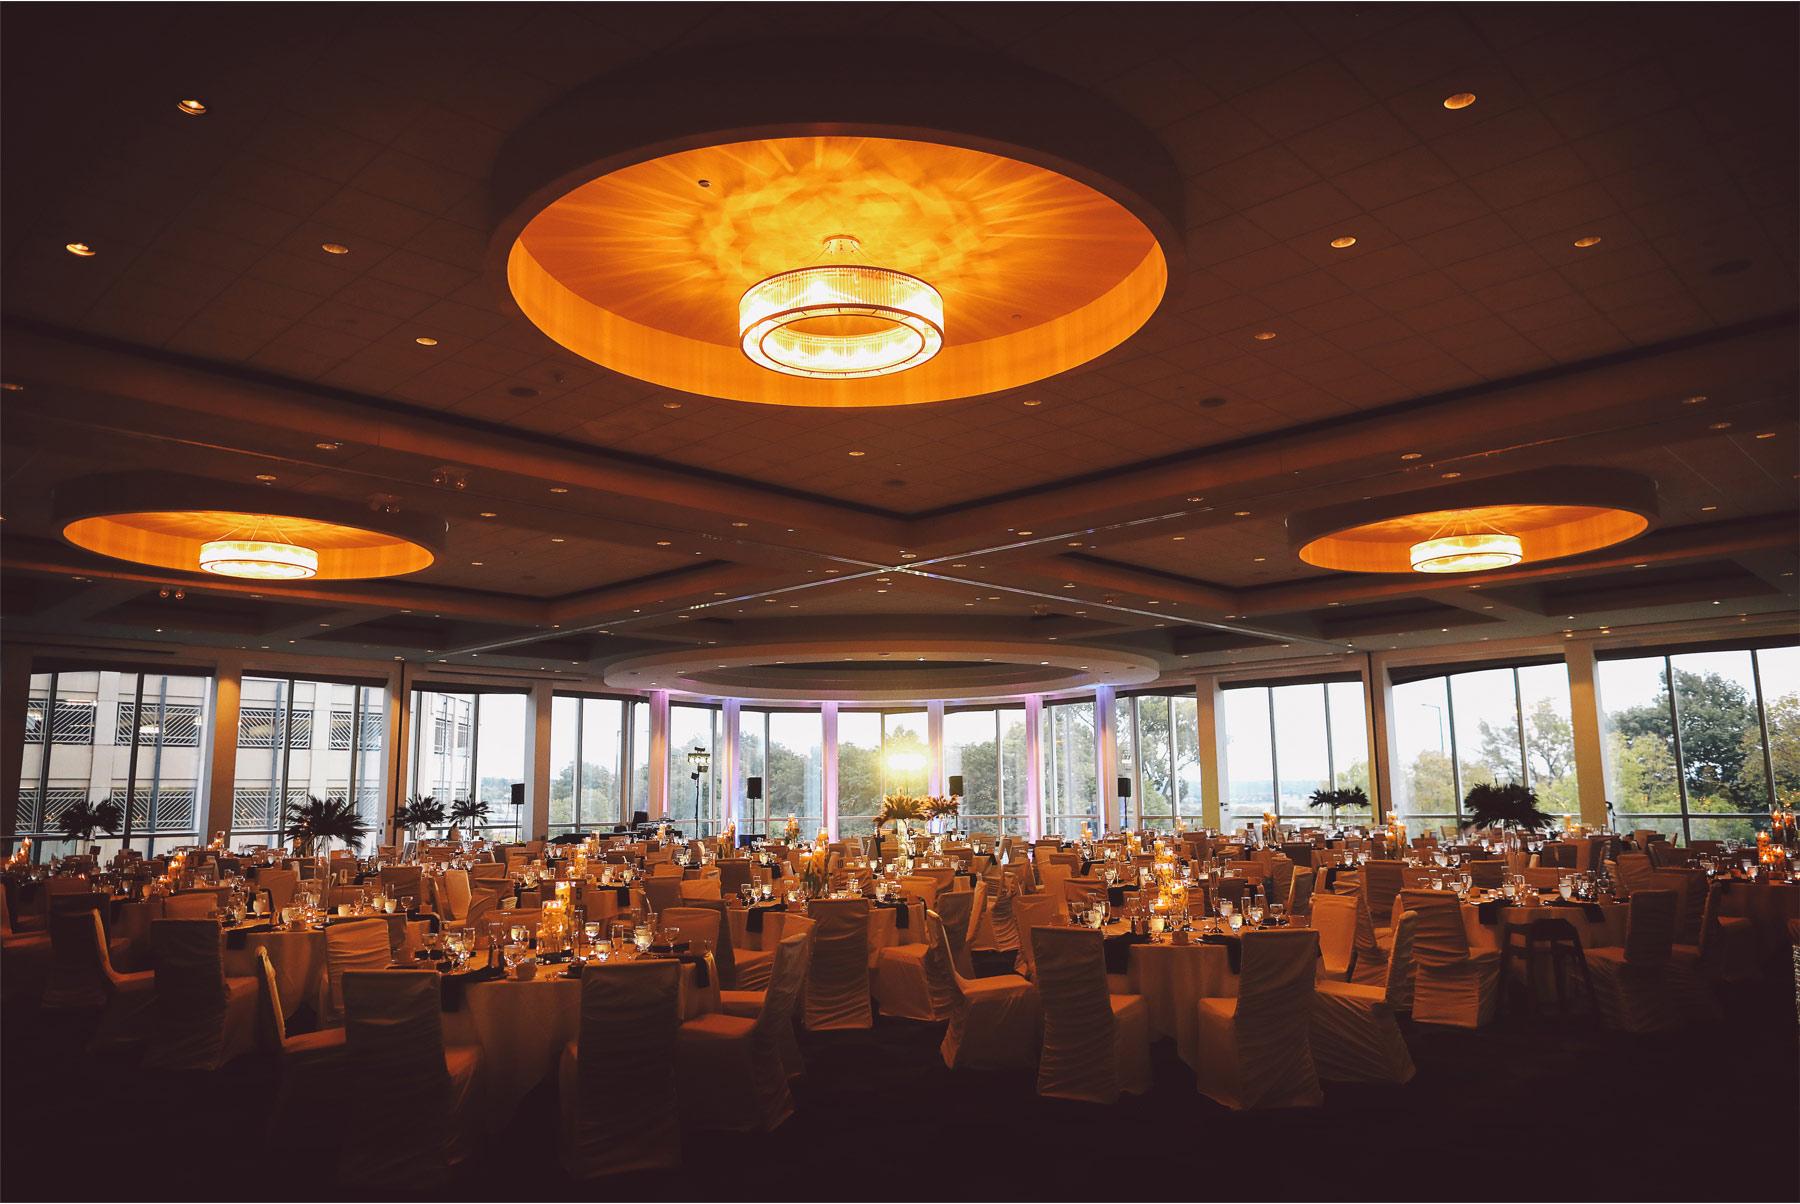 19-St-Paul-Minnesota-Wedding-Photography-by-Vick-Photography-Intercontinental-St-Paul-Riverfront-Reception-Leena-and-Michael.jpg